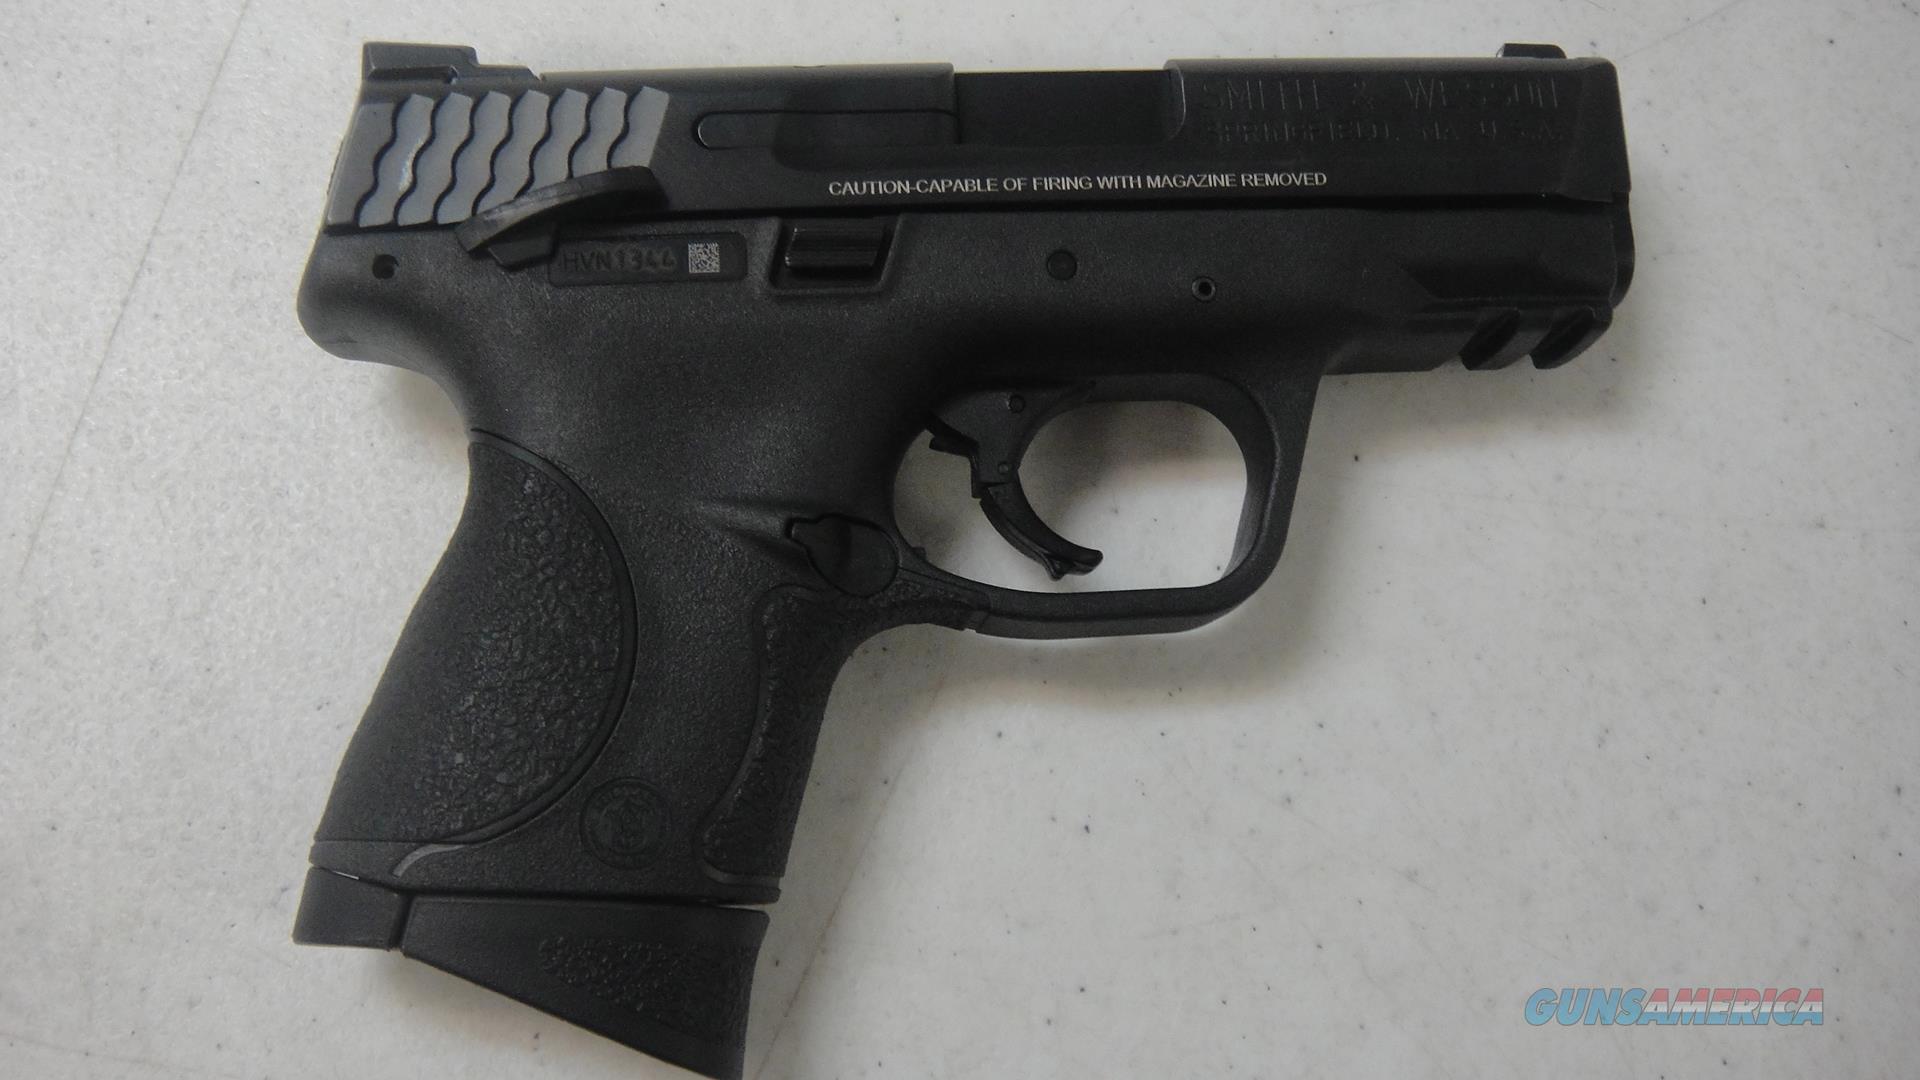 Smith & Wesson M+P 40c  Guns > Pistols > Smith & Wesson Pistols - Autos > Polymer Frame